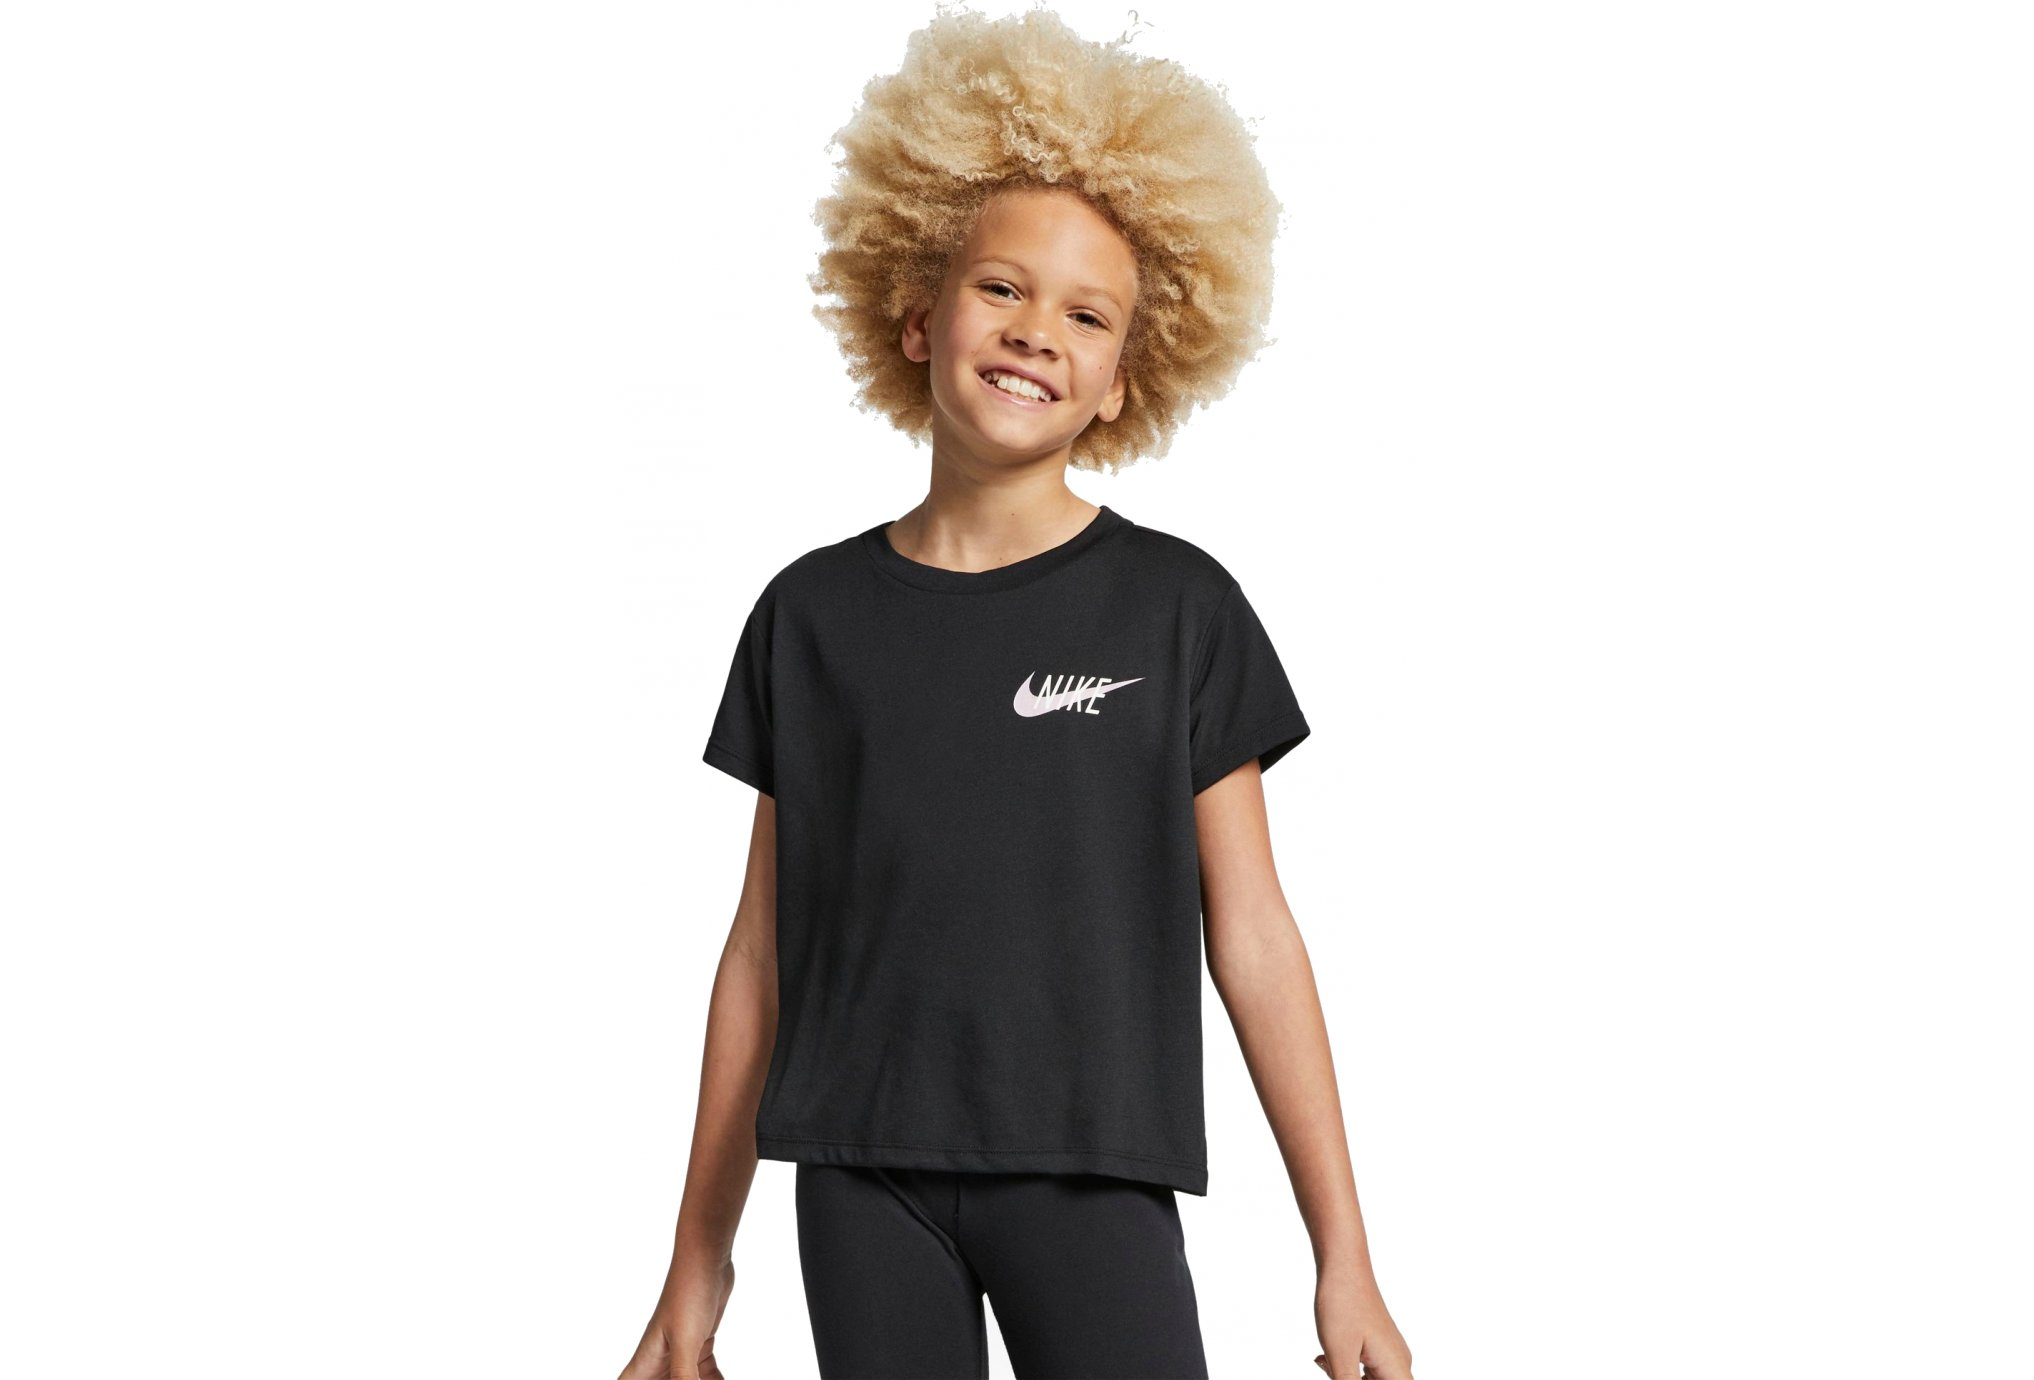 Nike Dri-Fit GX Fille vêtement running femme